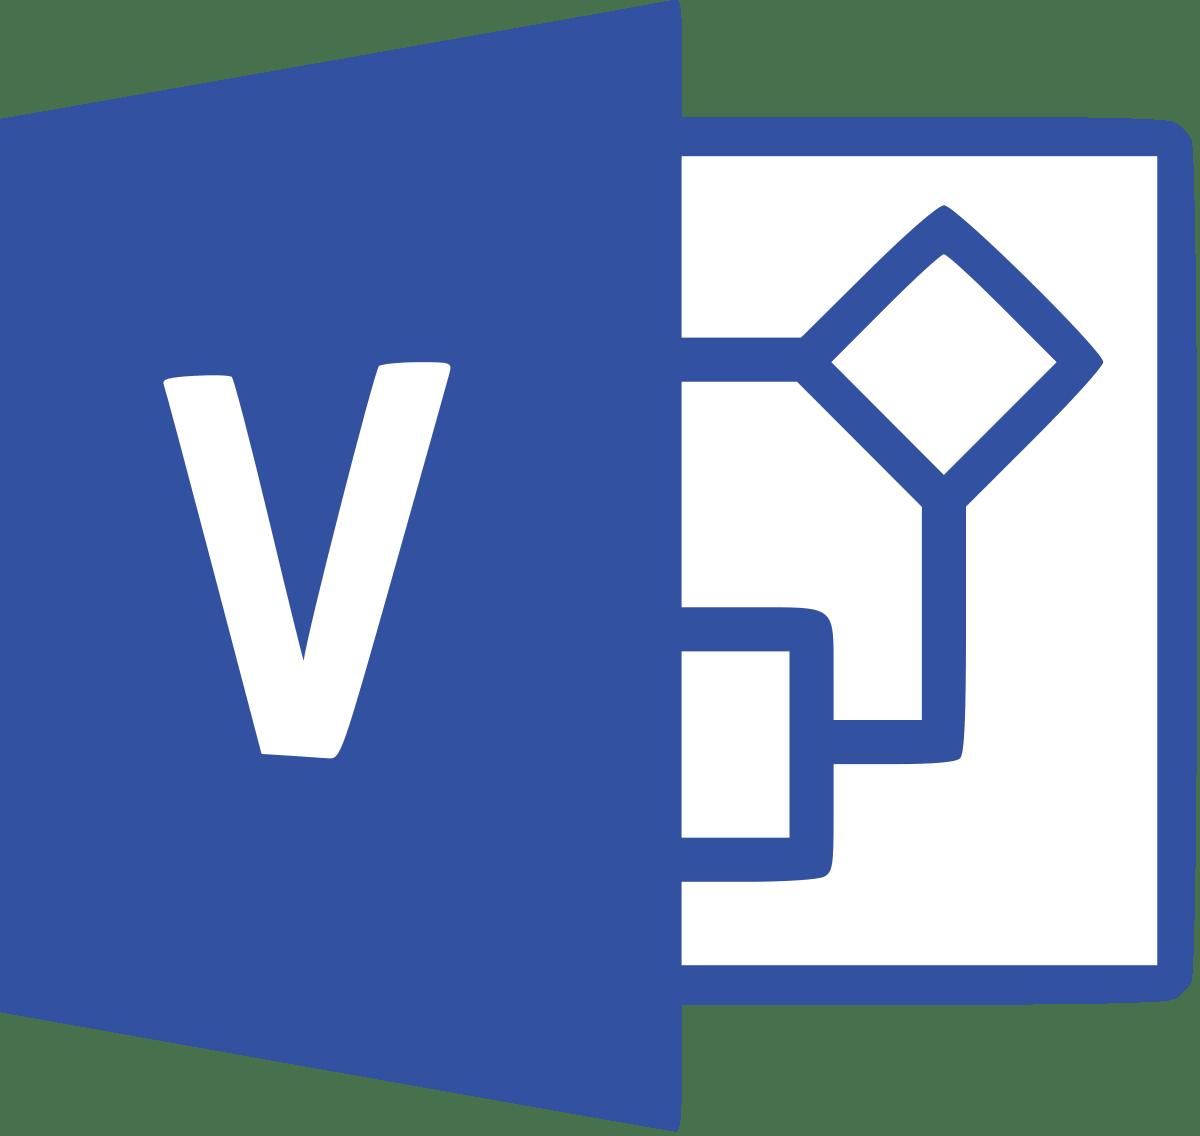 Microsoft Visio Pro Crack & Product Key Full Latest 2020 [Updated]